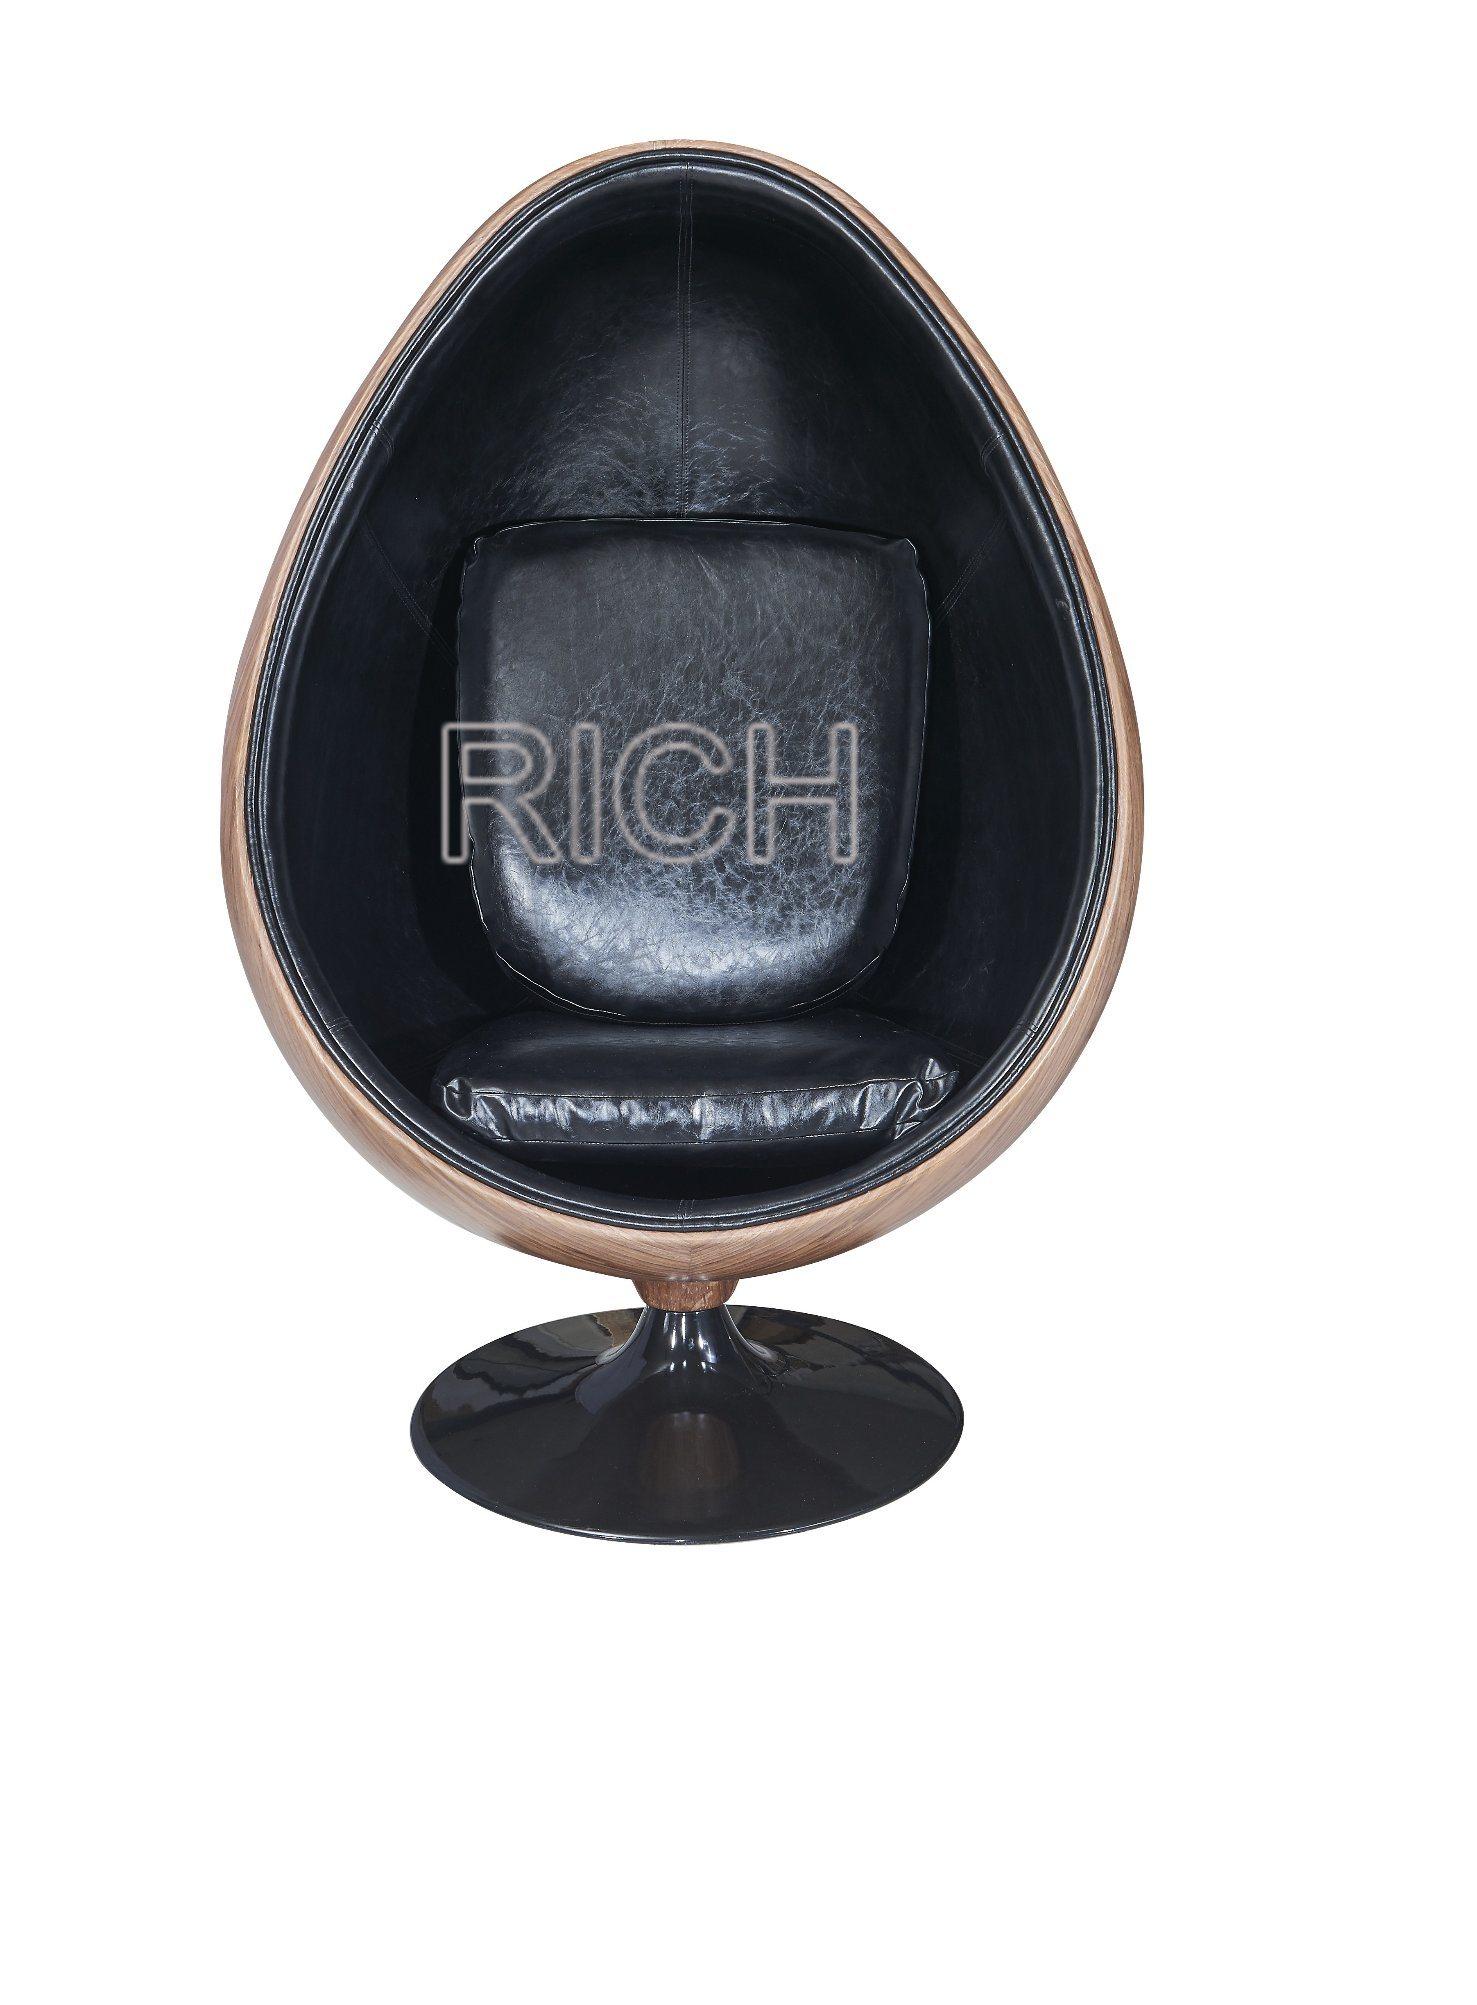 China buy modern round fiberglass egg pod lounge wood veneer chair china egg shaped chair egg pod chair for sale